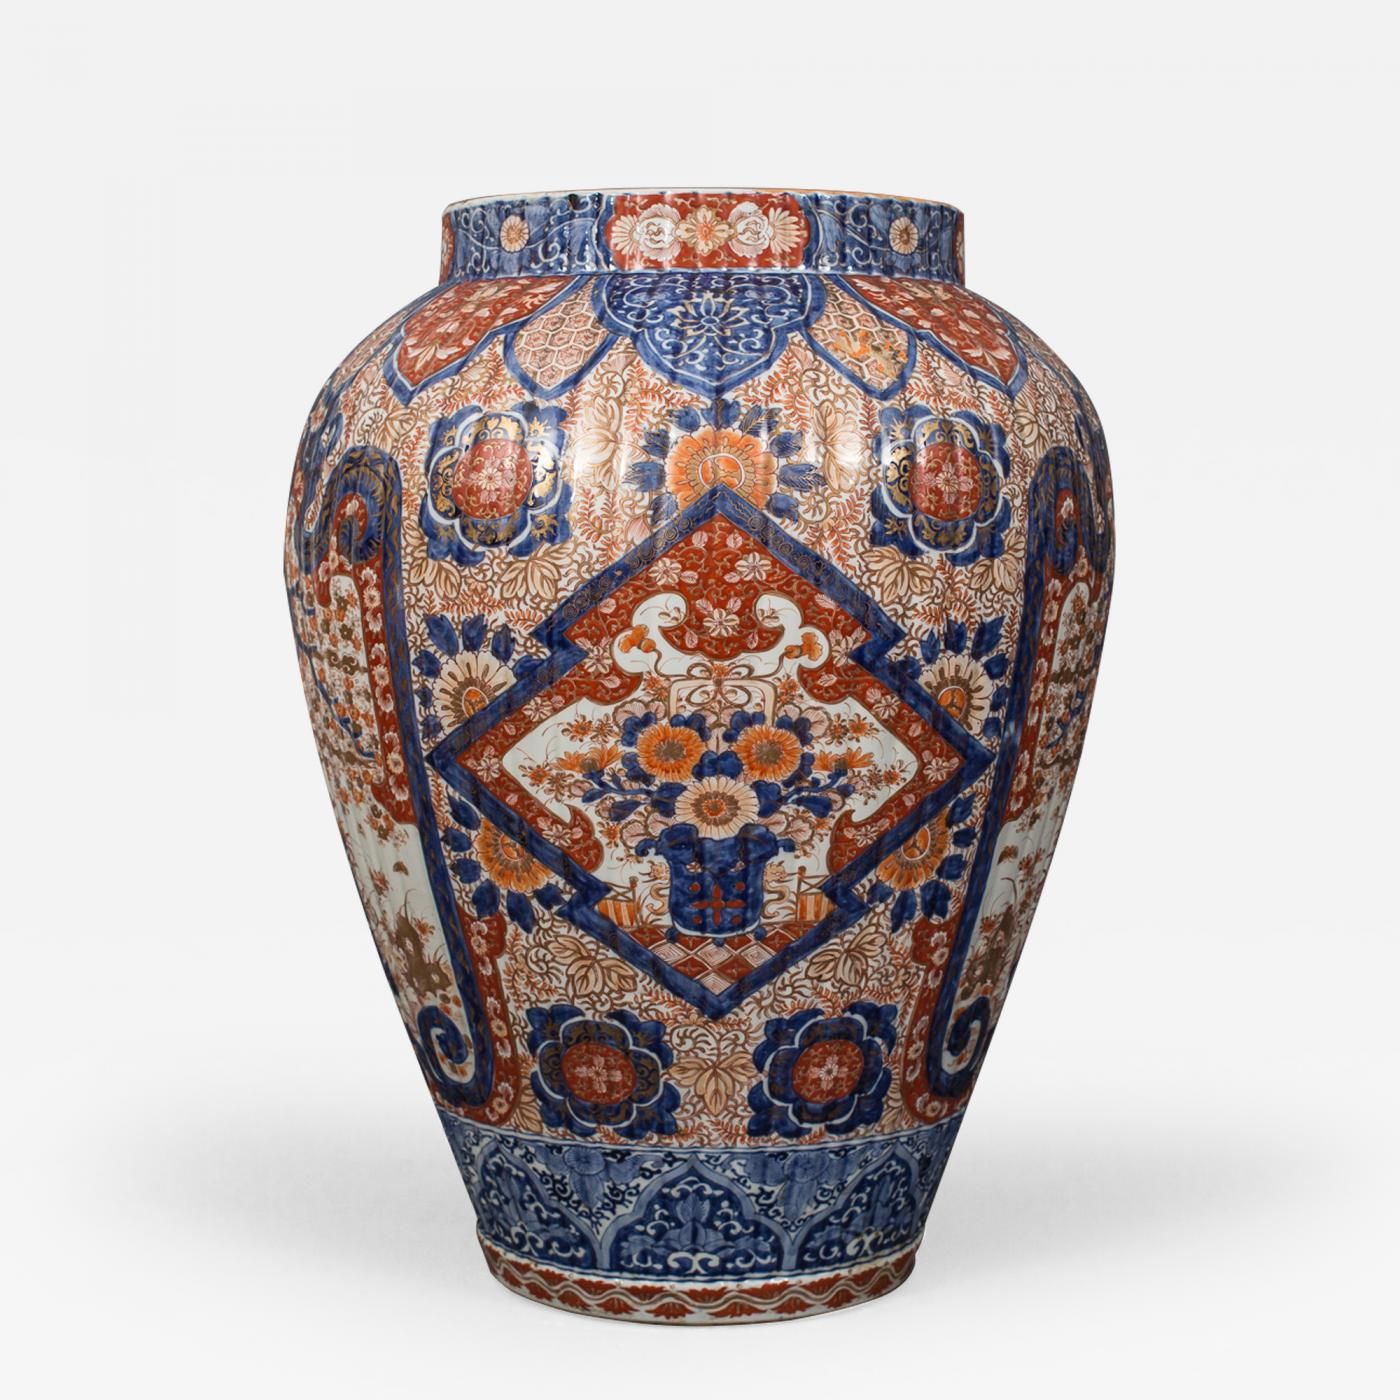 Japanese imari tall fluted vase listings decorative arts objects vases jars urns japanese imari tall fluted vase reviewsmspy